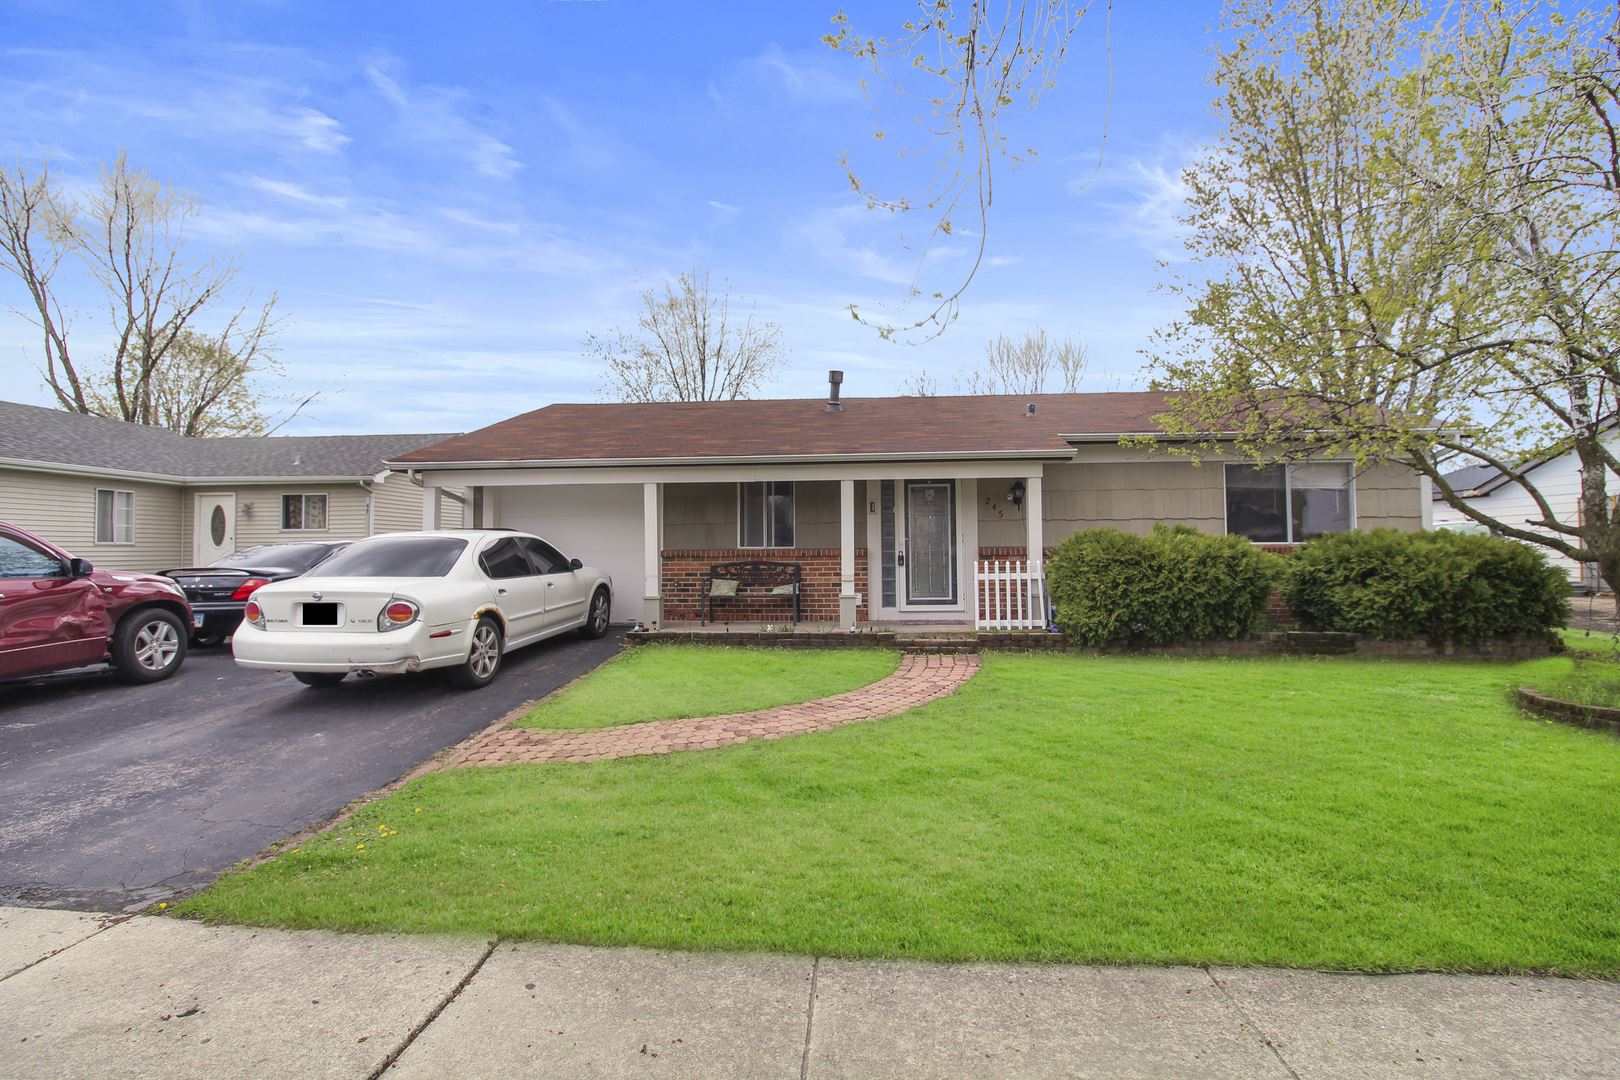 Photo of 245 Plainview Drive, Bolingbrook, IL 60440 (MLS # 11052776)